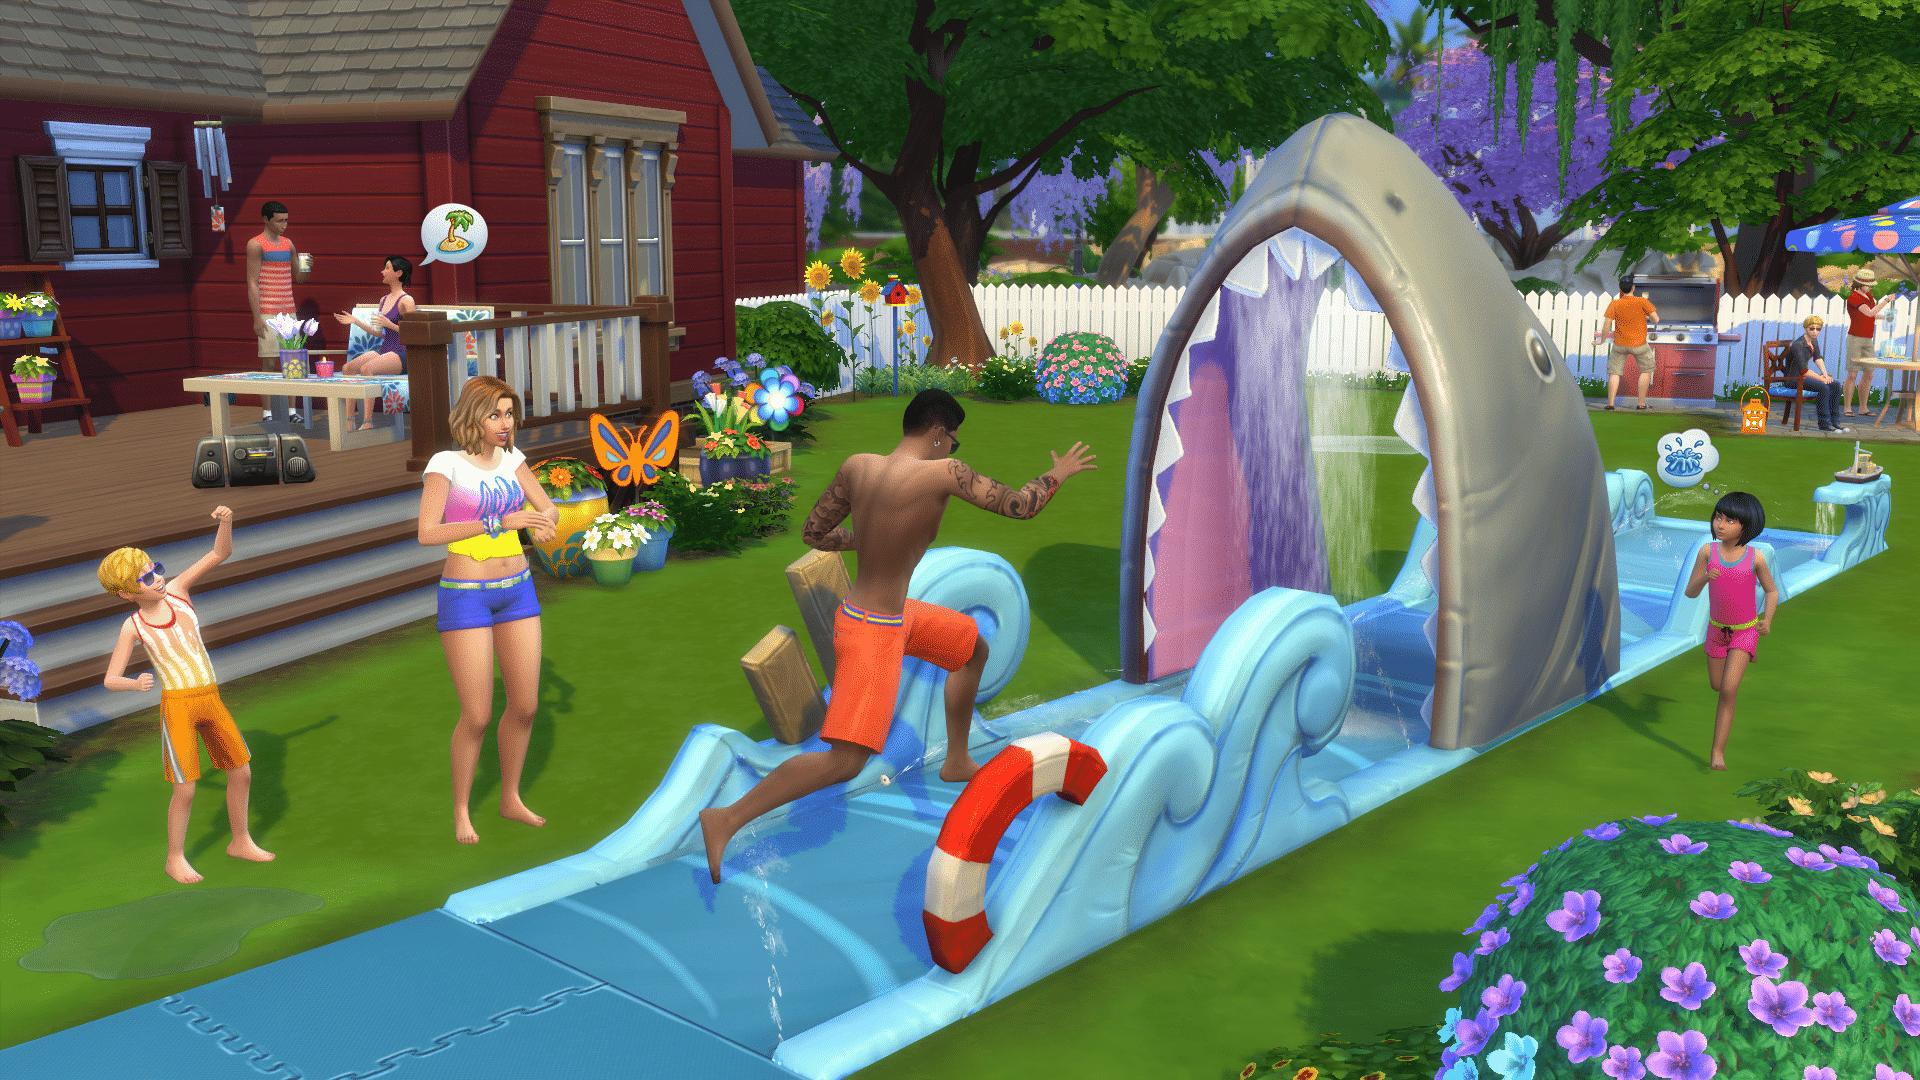 The Sims 4 Backyard Stuff: Official Logo, Renders, Screens ...